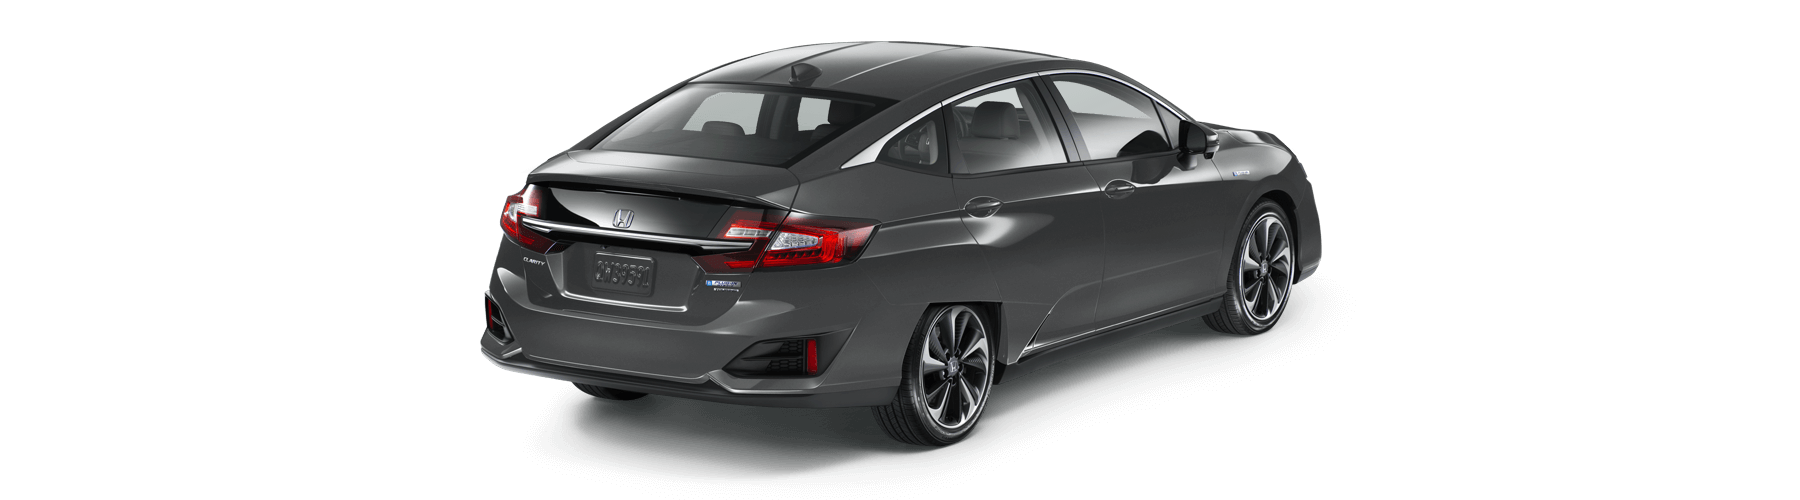 2018 Honda Clarity Plug-In Hybrid Rear Angle